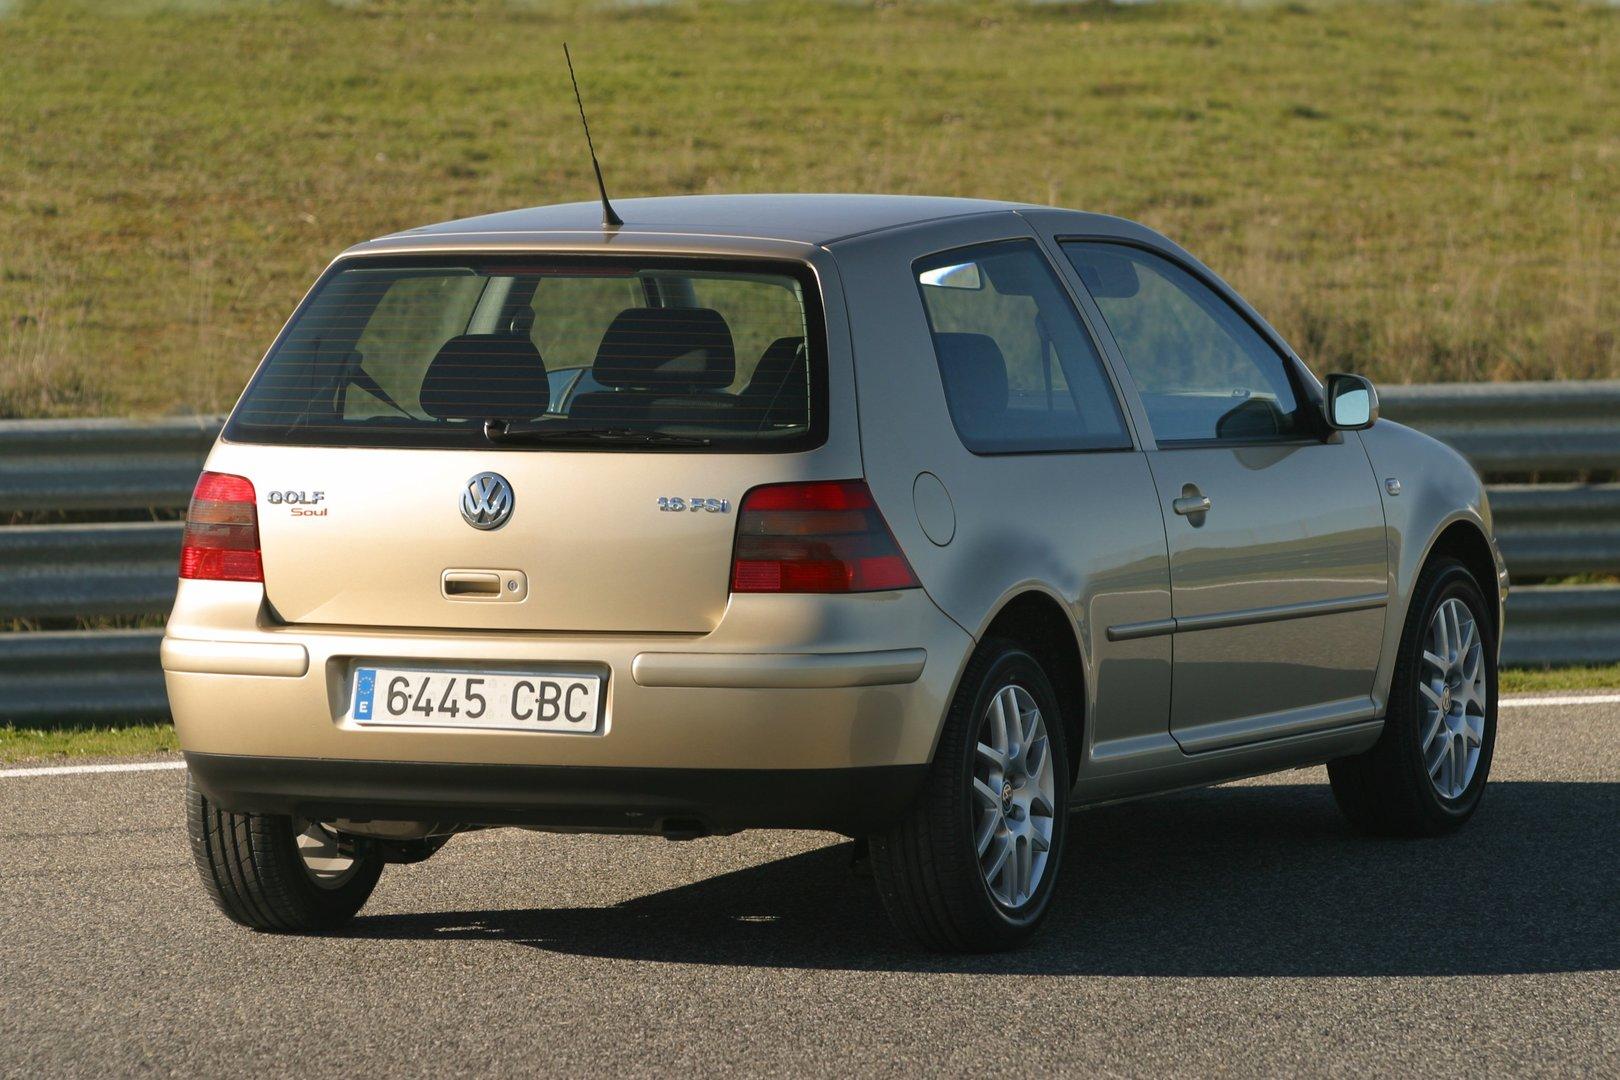 Volkswagen Golf 3p FSI 1J 5